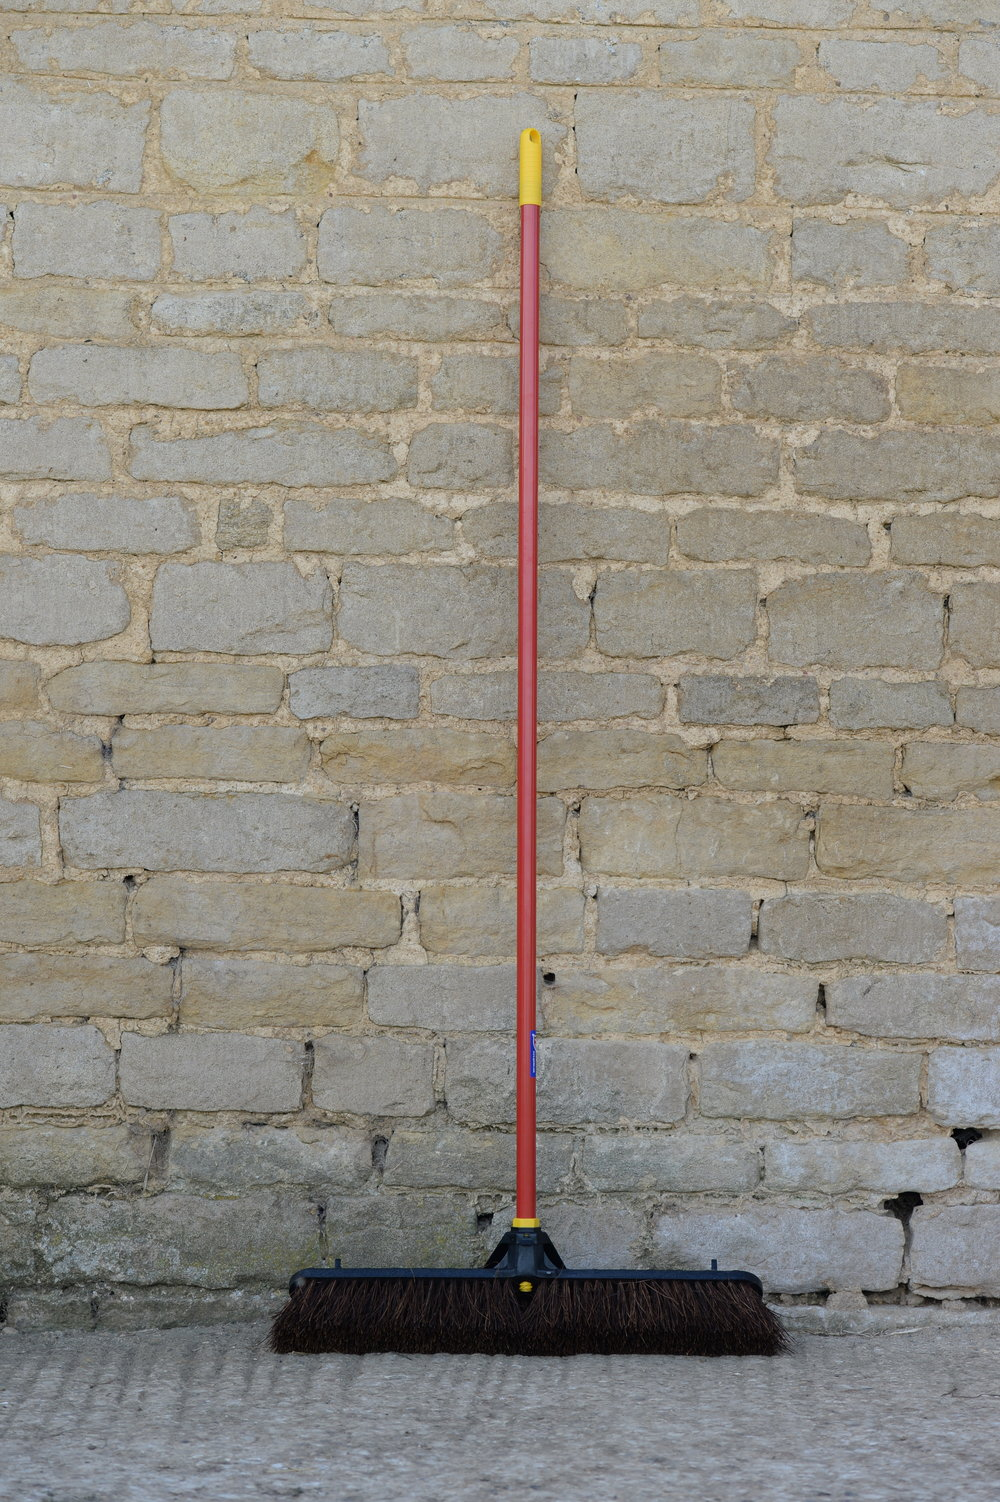 Bulldozer broom